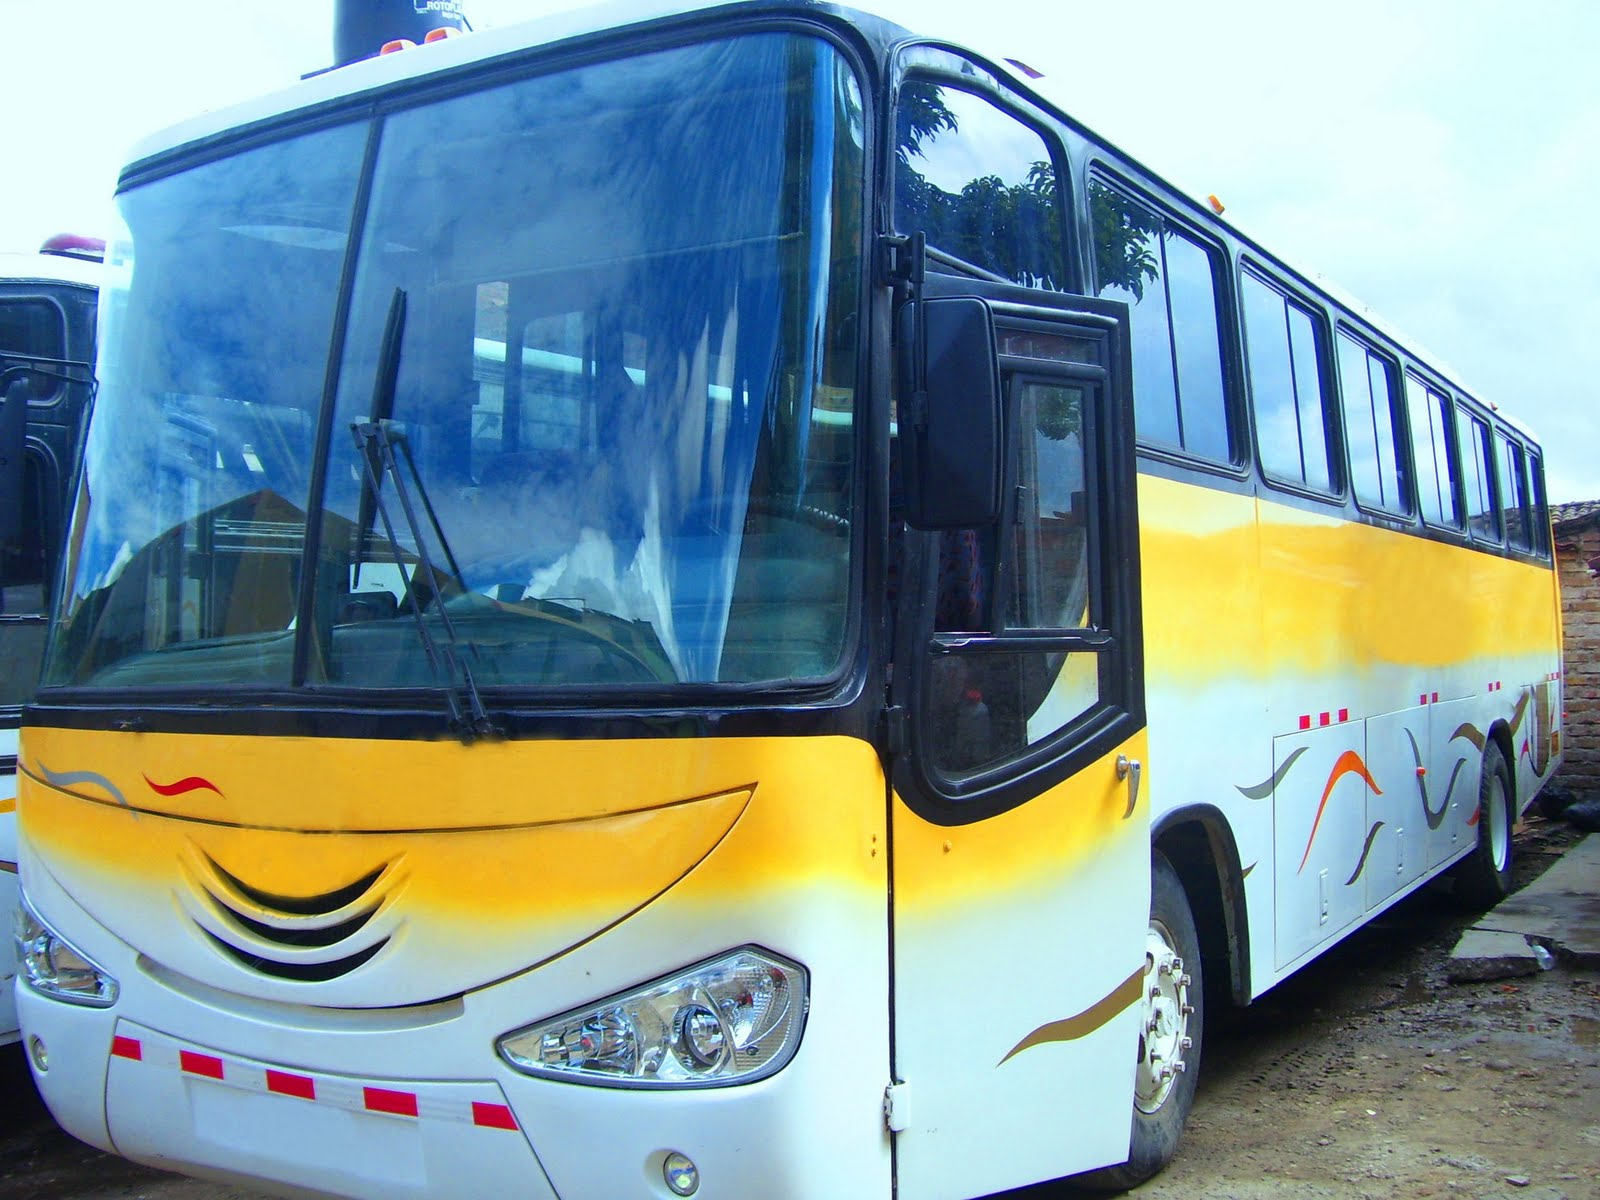 Venta De Buses Y Carrocerias Bus Volvo Modb7 1994 49 Pasj